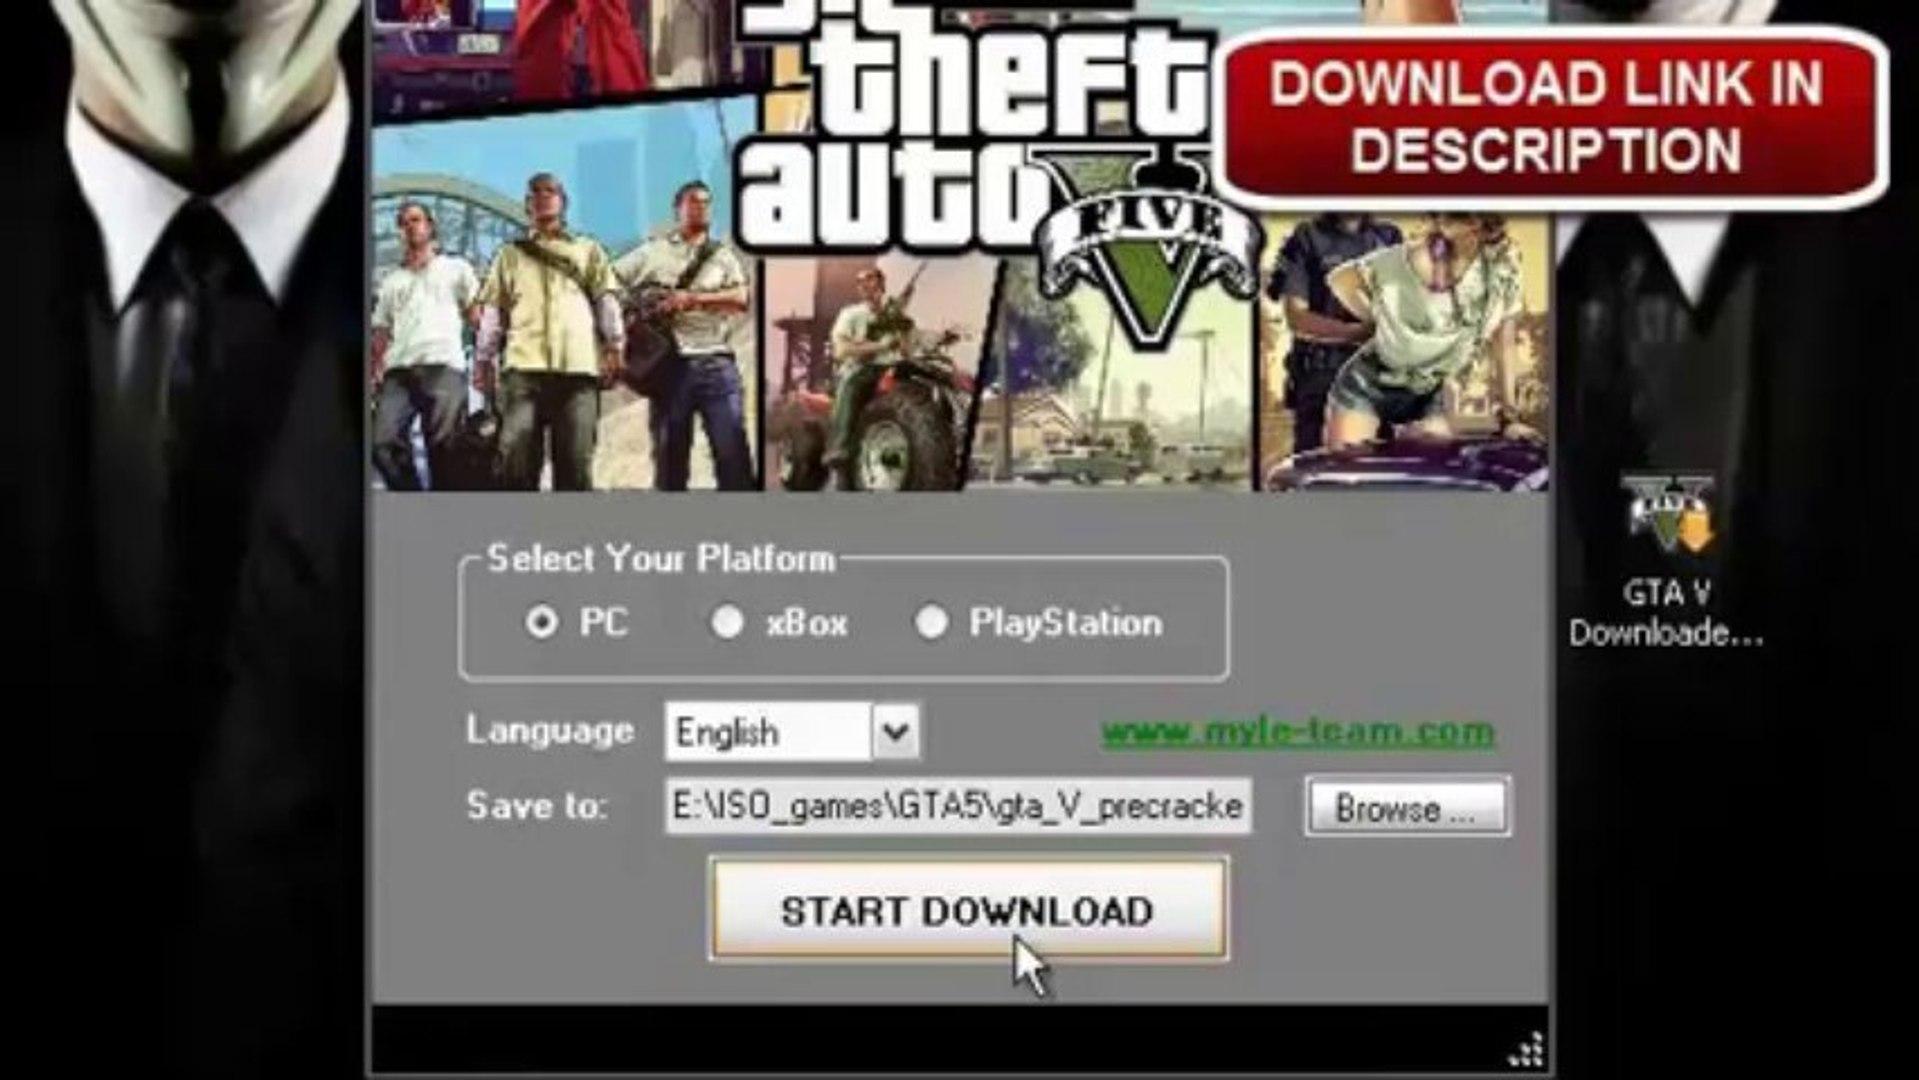 Hot Gta V Full Pc Xbox 360 Ps3 Precracked 16 09 2013 Video Dailymotion